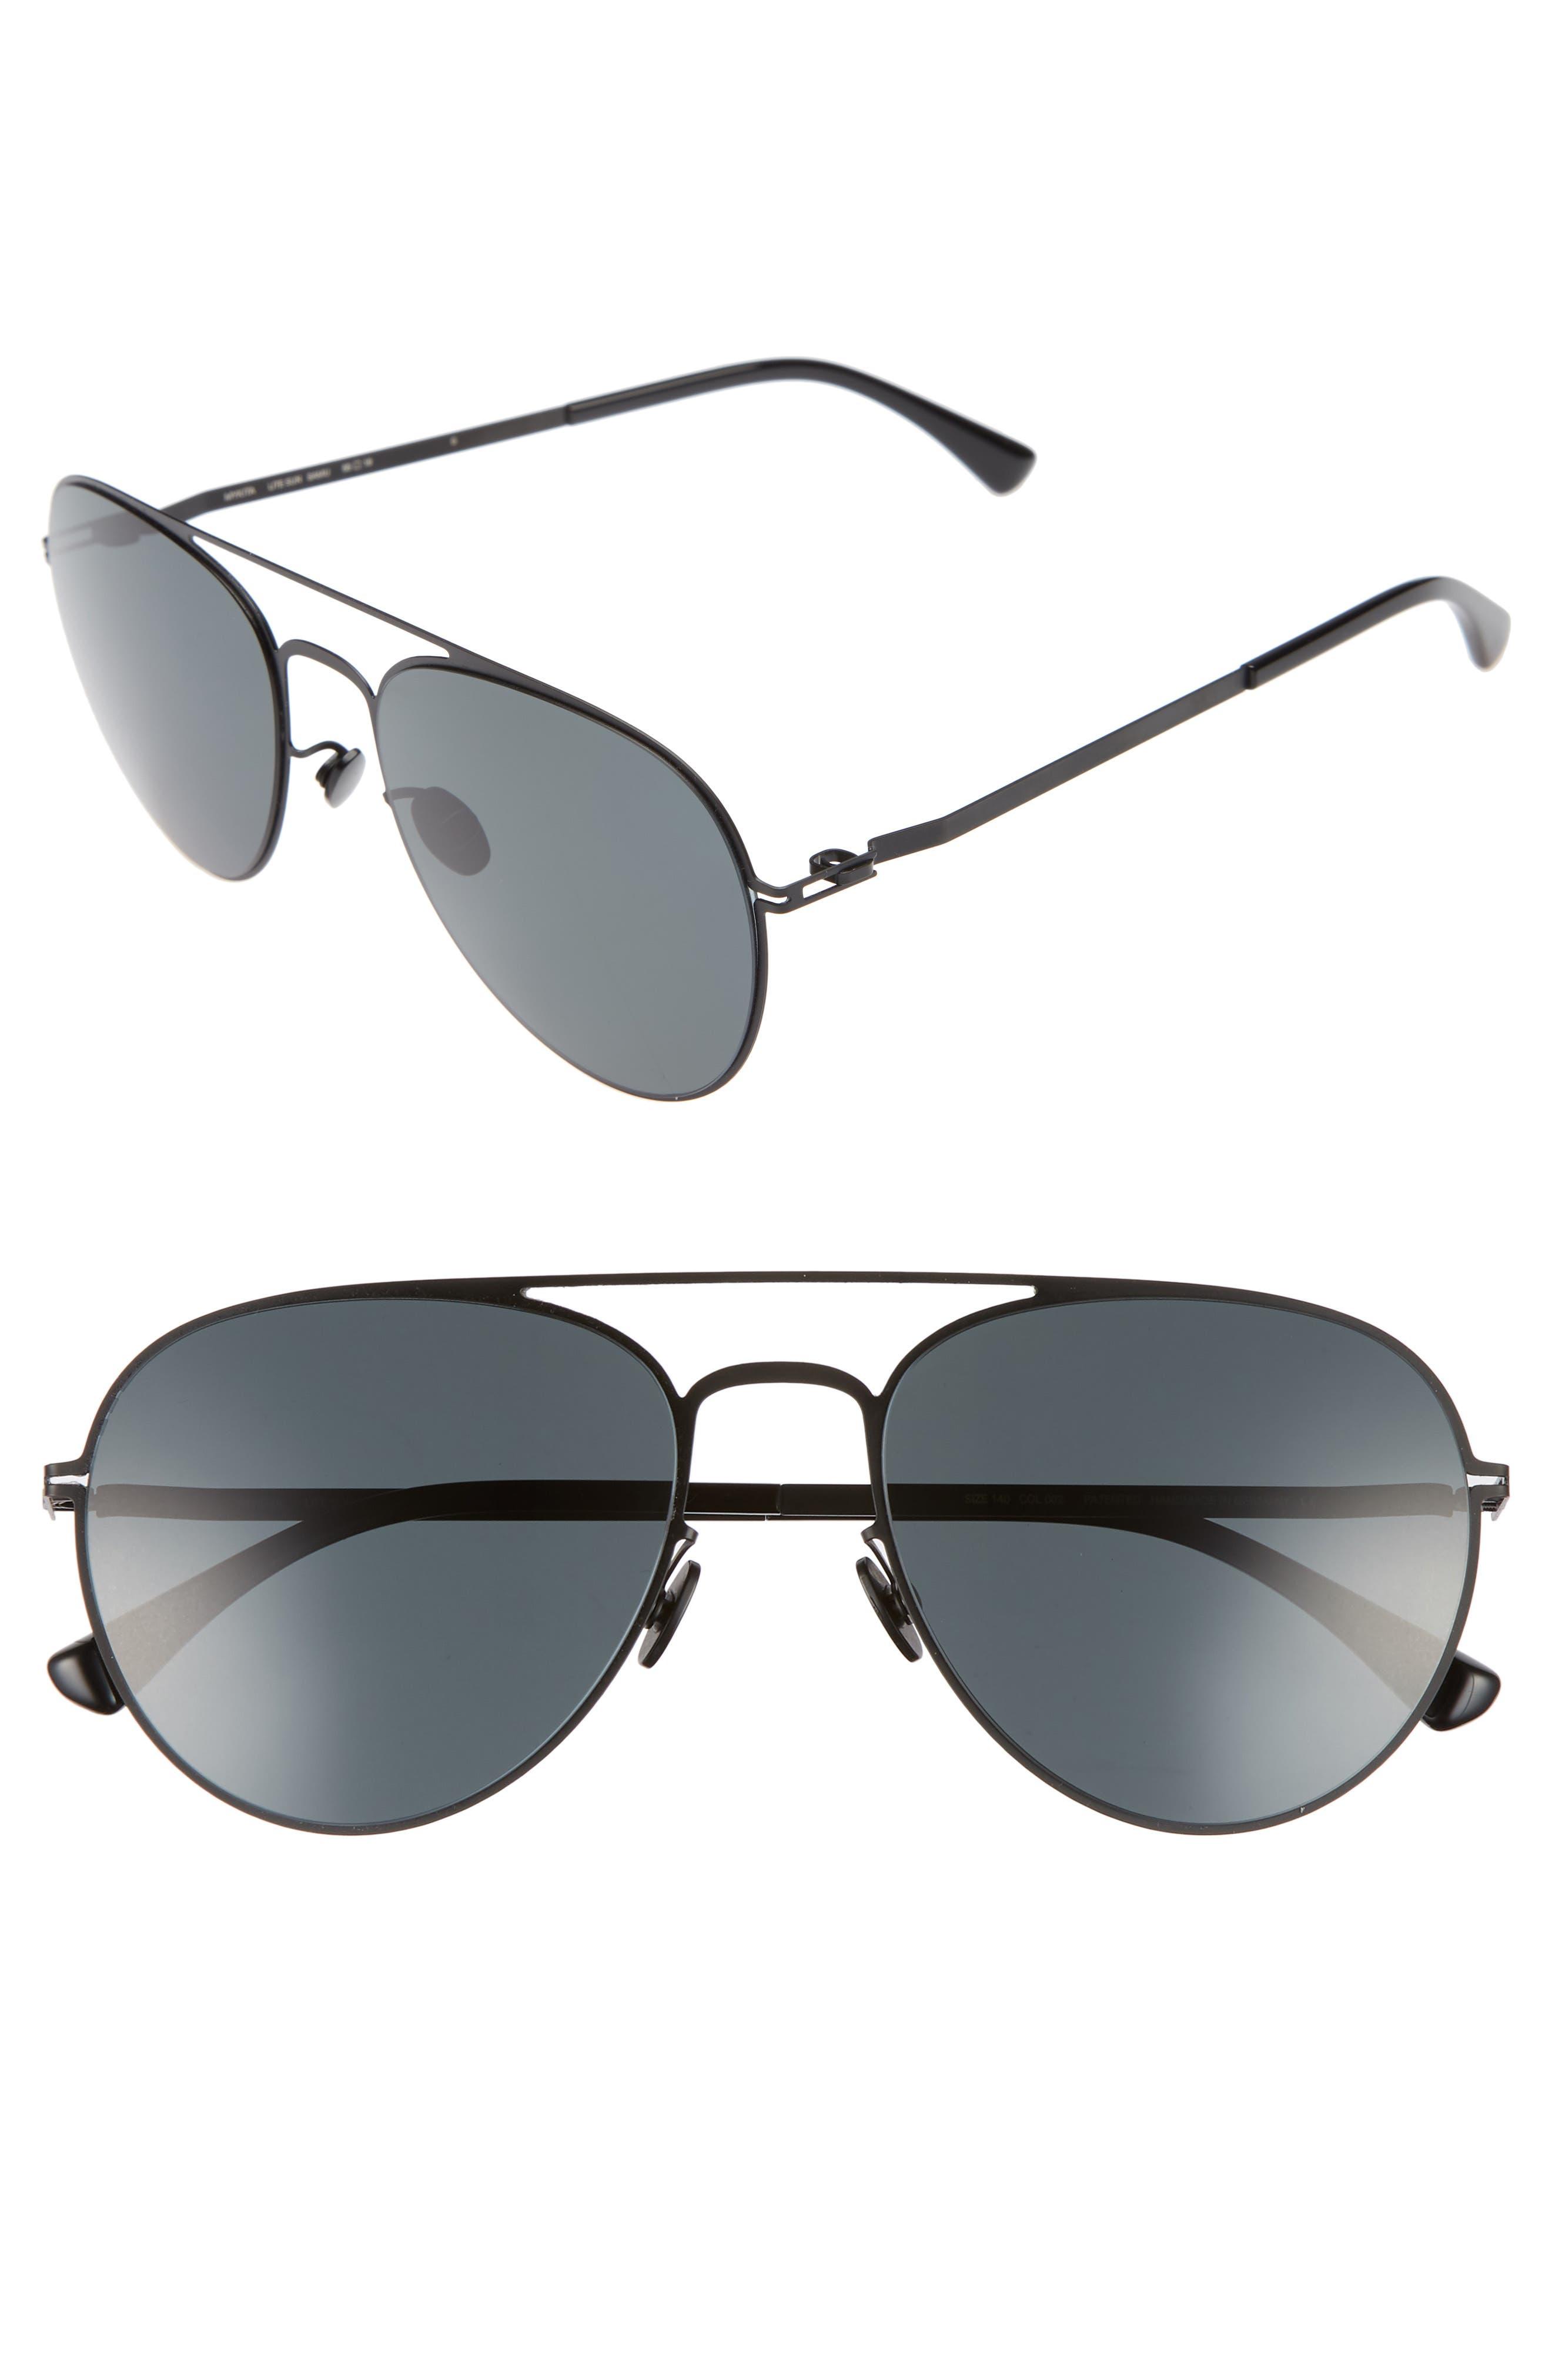 Samu 55mm Polarized Aviator Sunglasses,                             Main thumbnail 1, color,